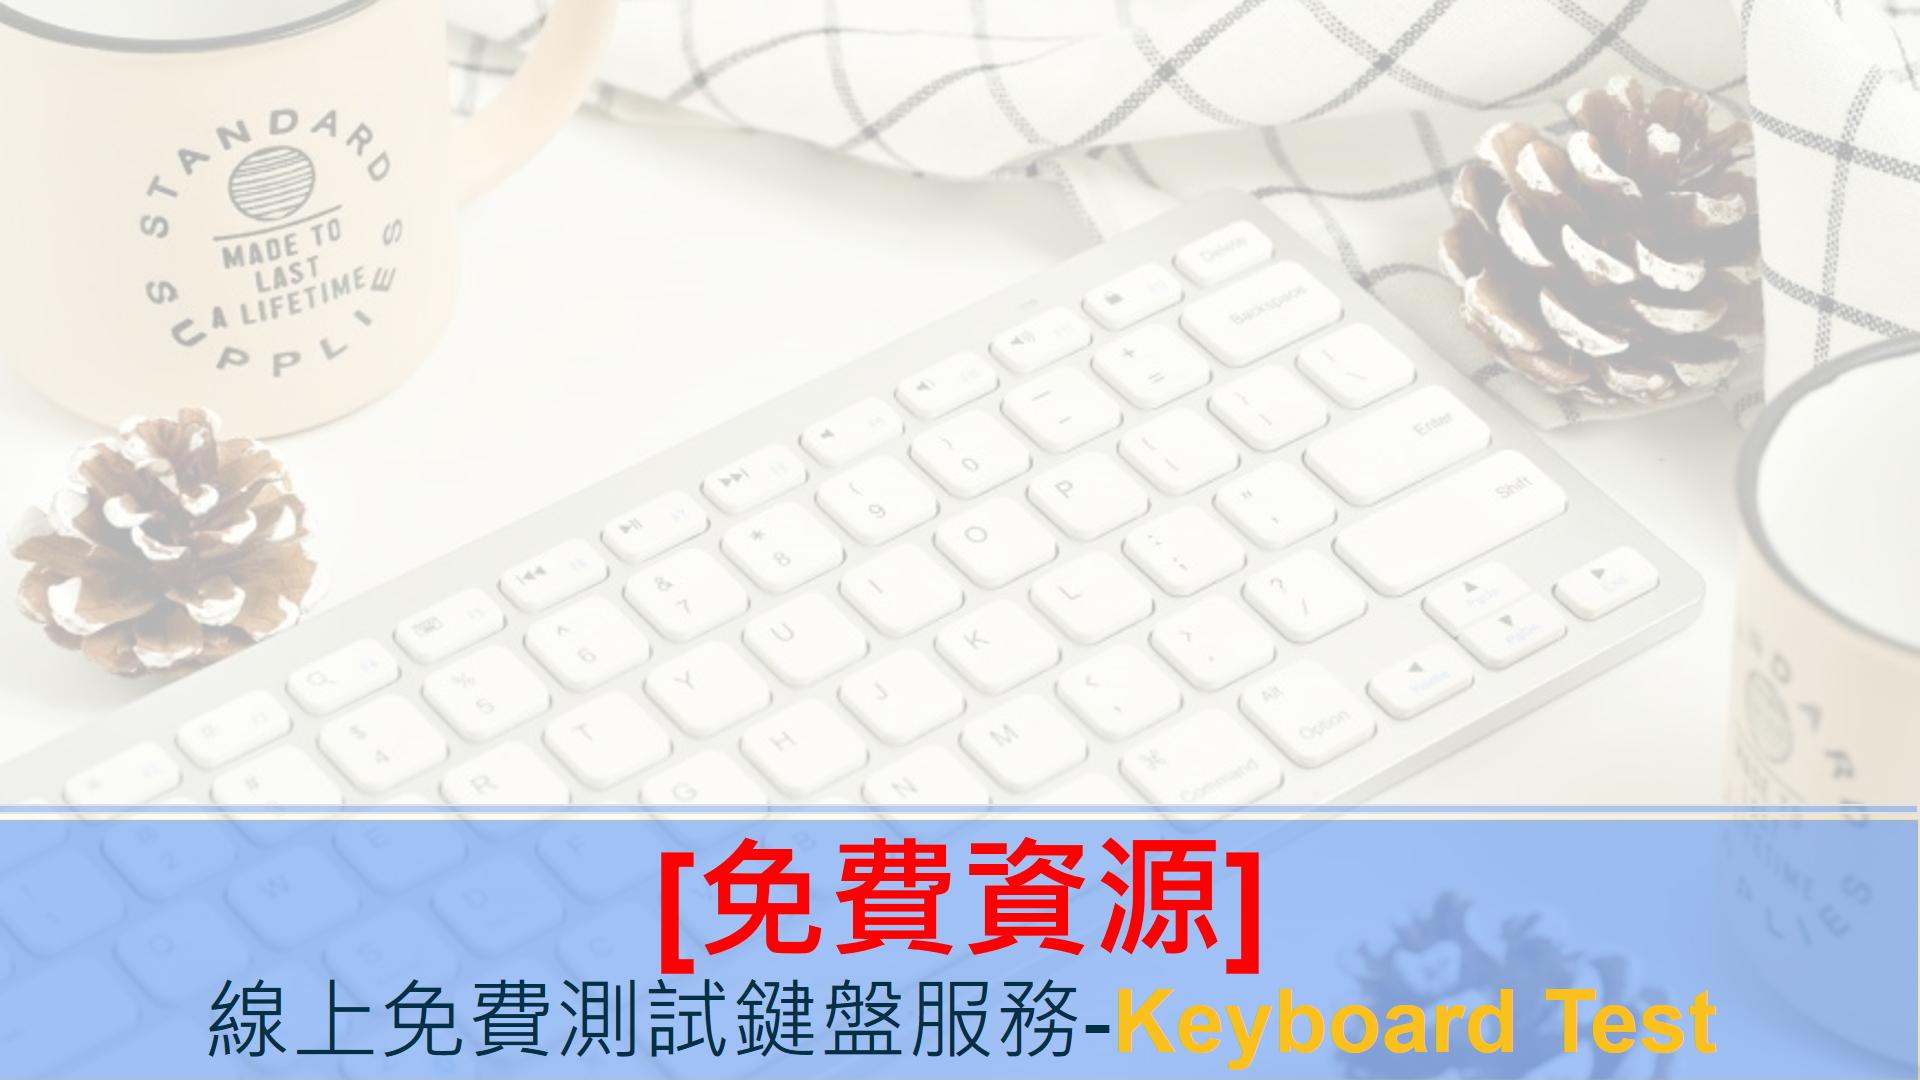 00.Keyboard Test Intro